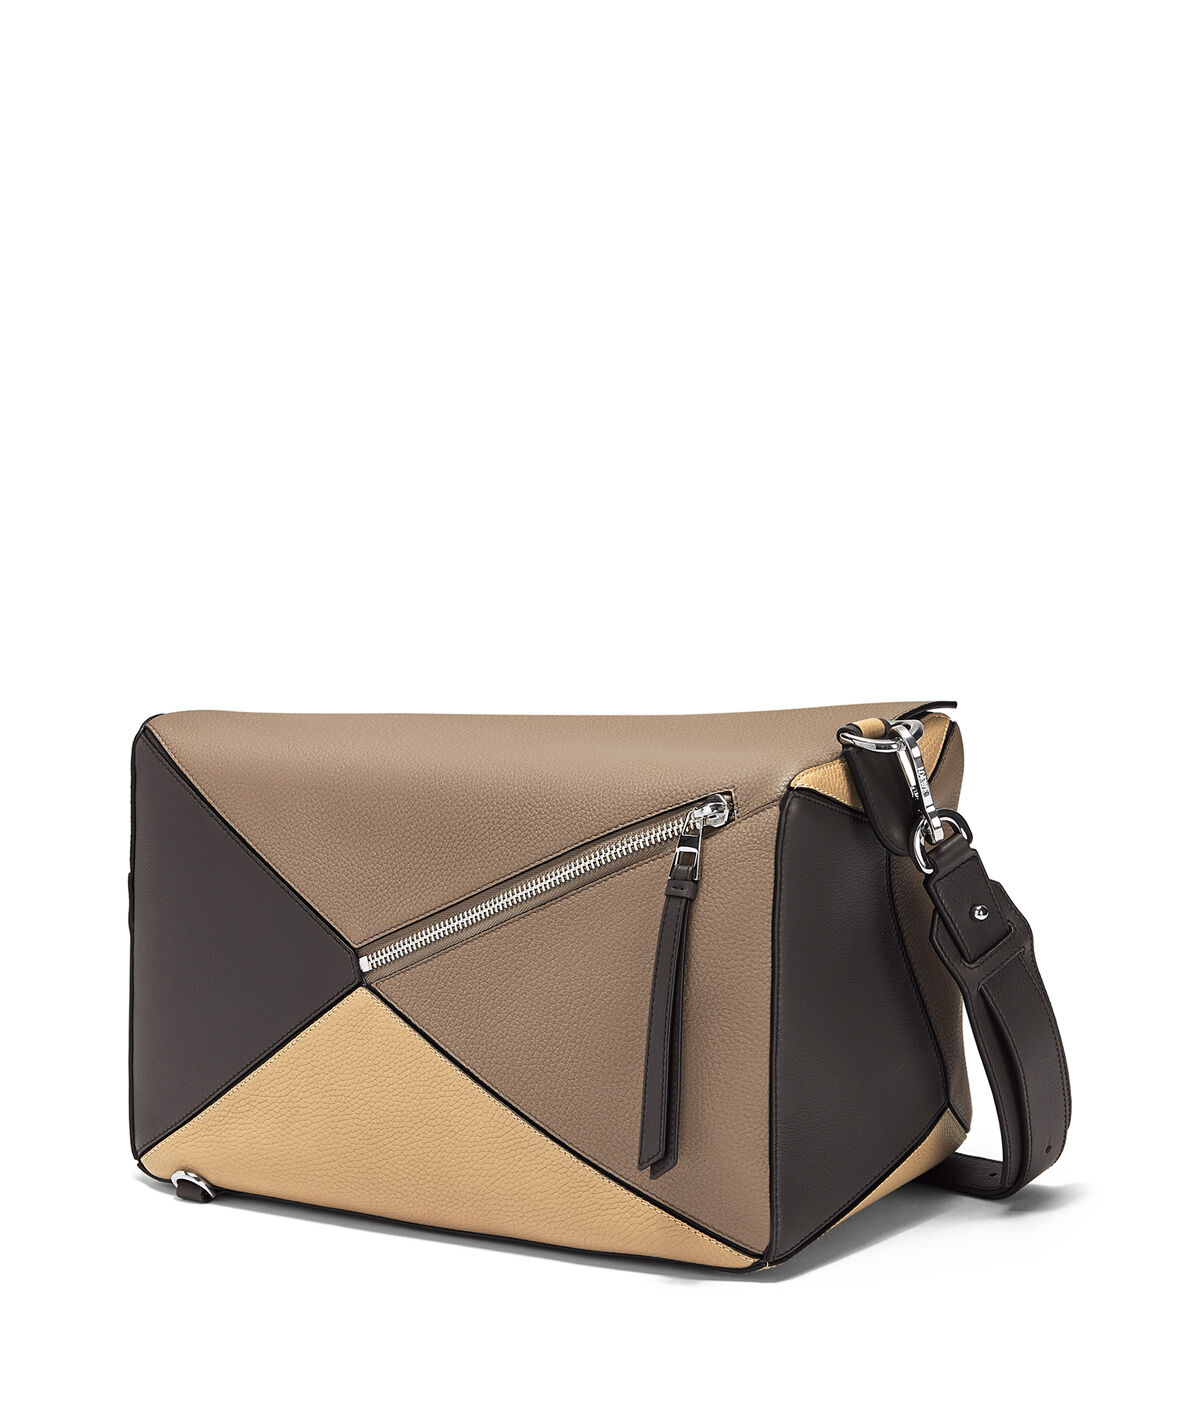 LOEWE Puzzle Xl Bag Dark Taupe/Desert all